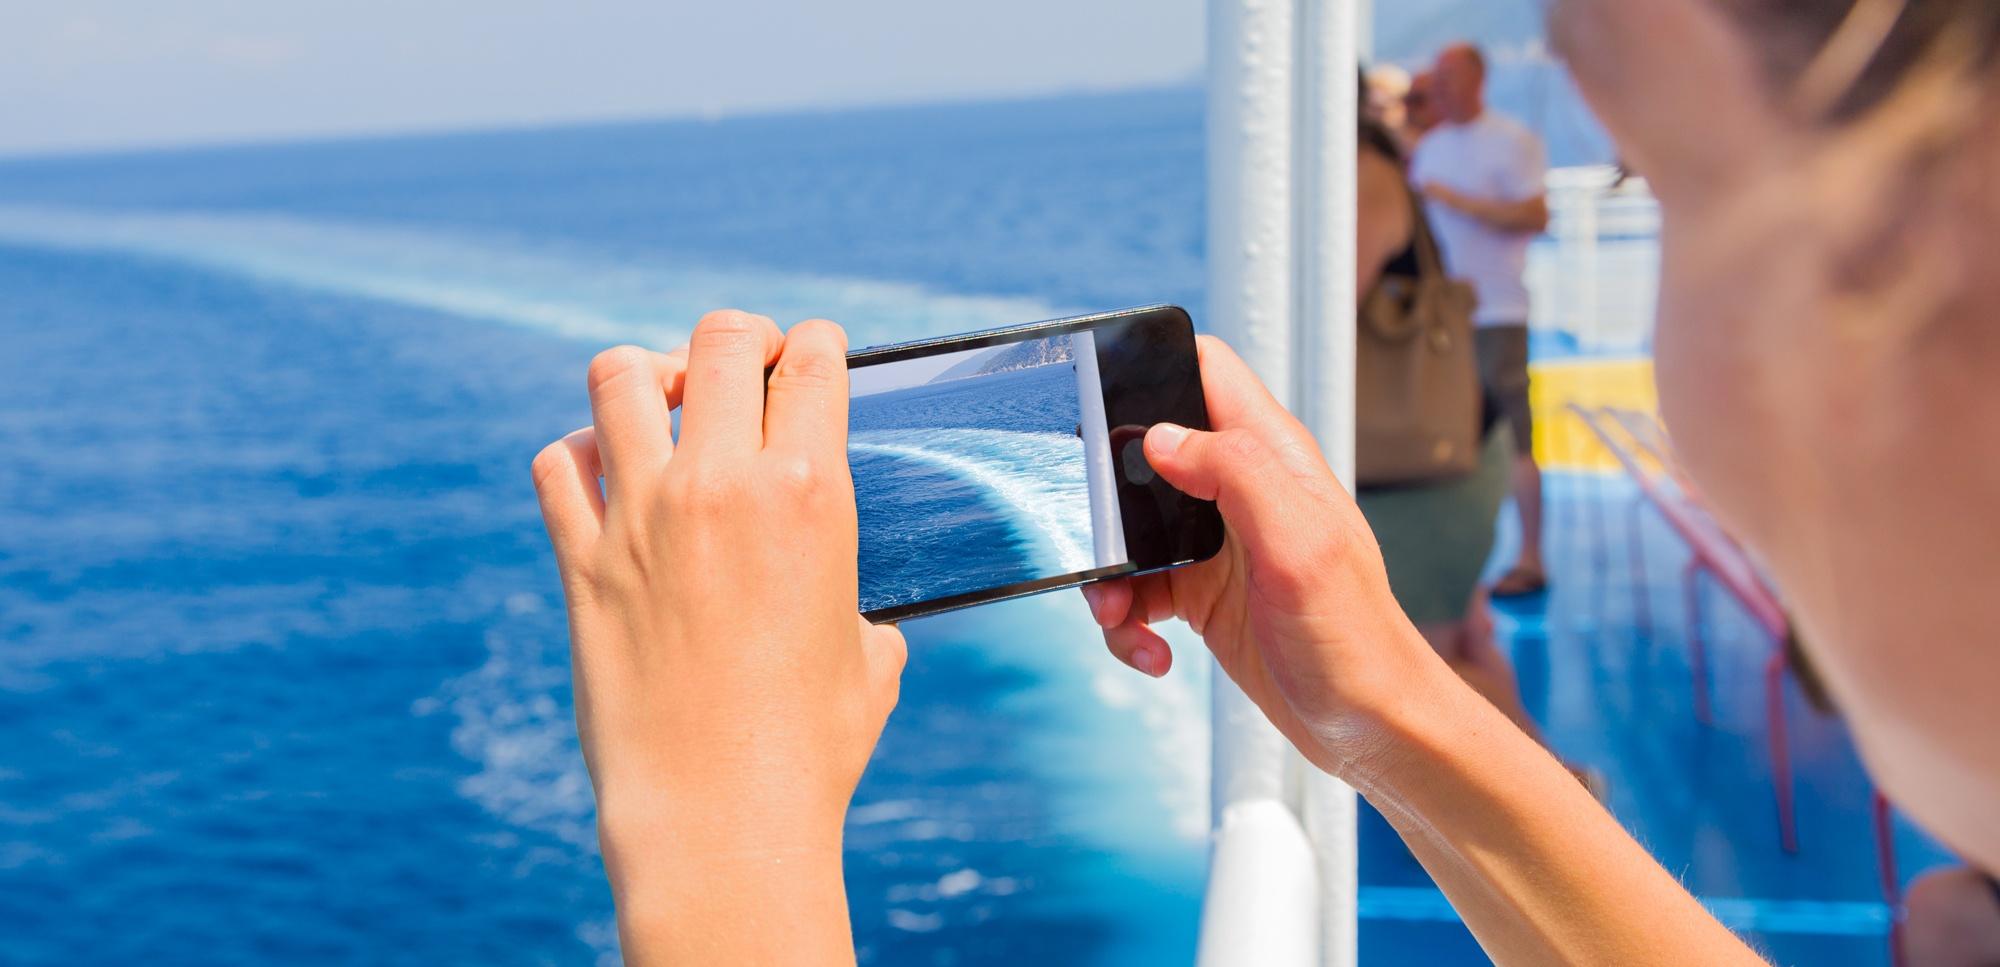 cruise-smartphone-bg.jpg